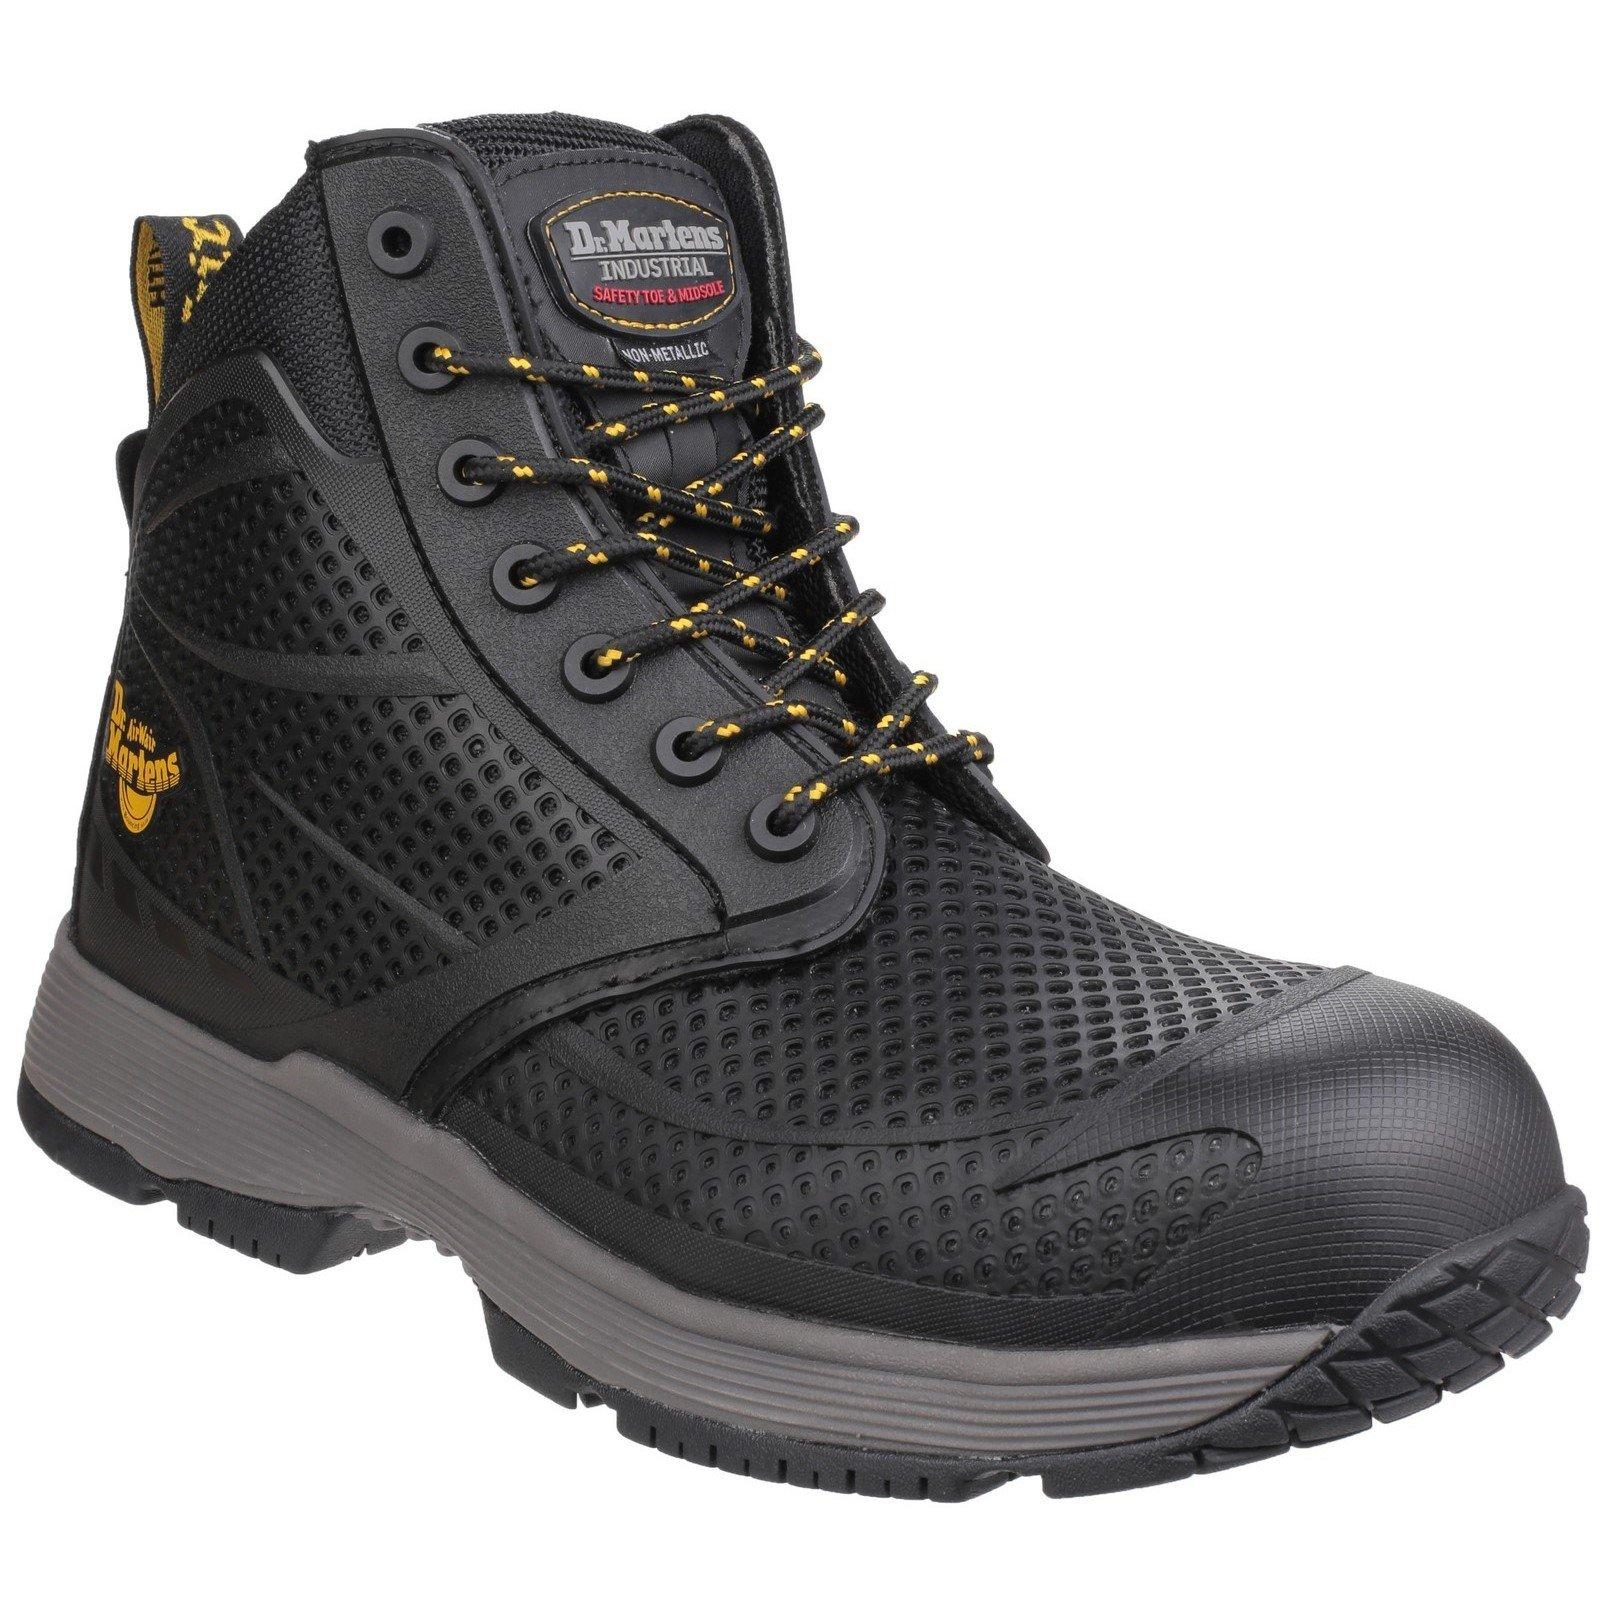 Dr Martens Unisex Calamus Lace up Safety Boot Black 24535-40574 - Black 9